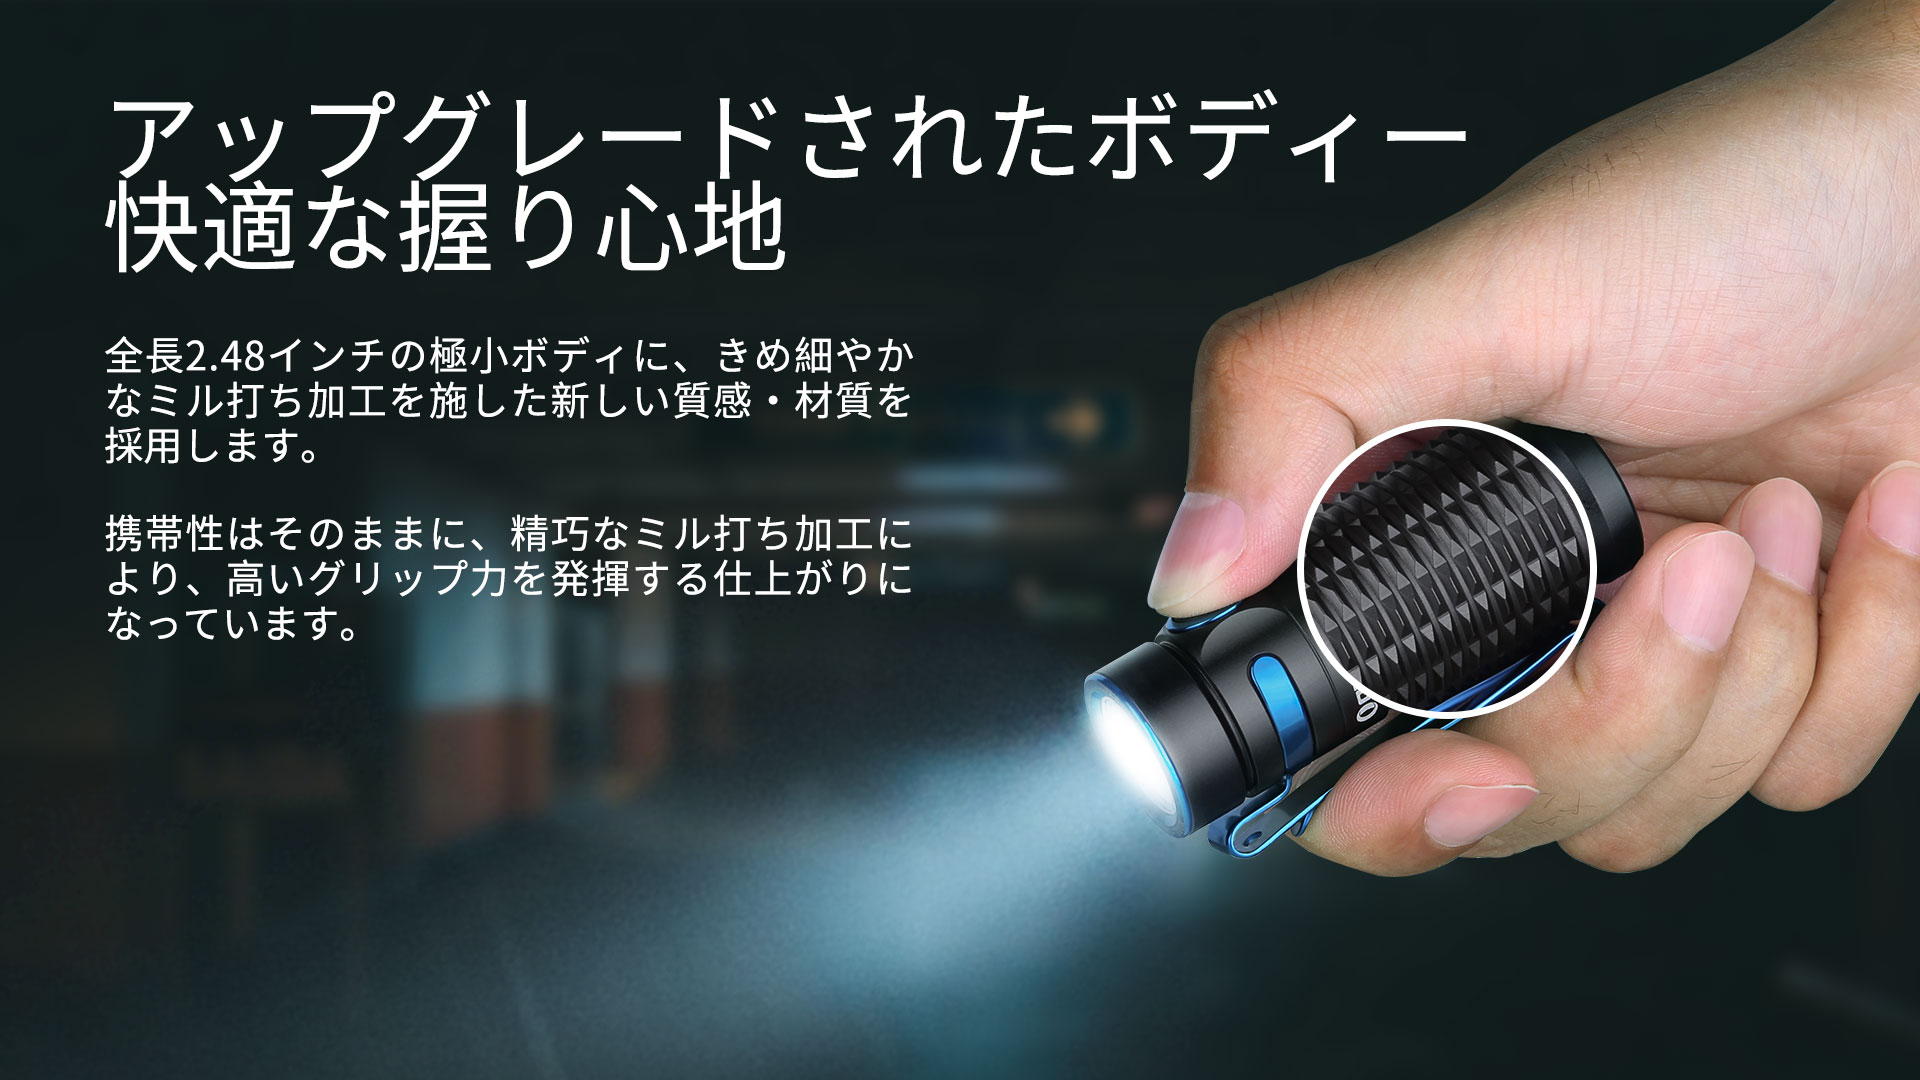 Baton3の全長は2.8インチで、新しいテクスチャデザイン、滑り止め、持ち運びが簡単です。